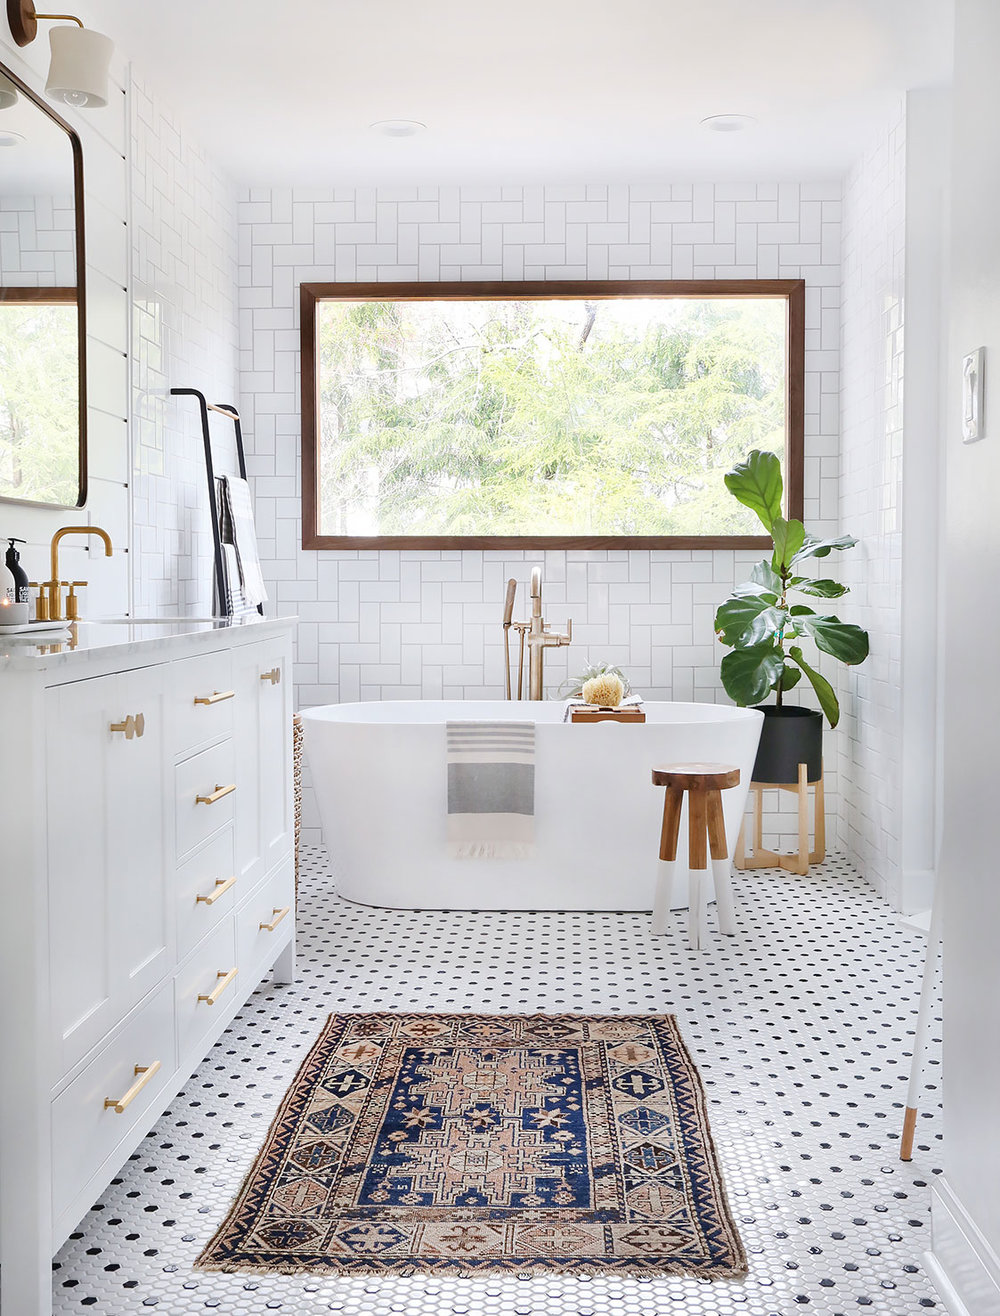 45 Master Bathroom Ideas 2019 (That Will Awe You) 45